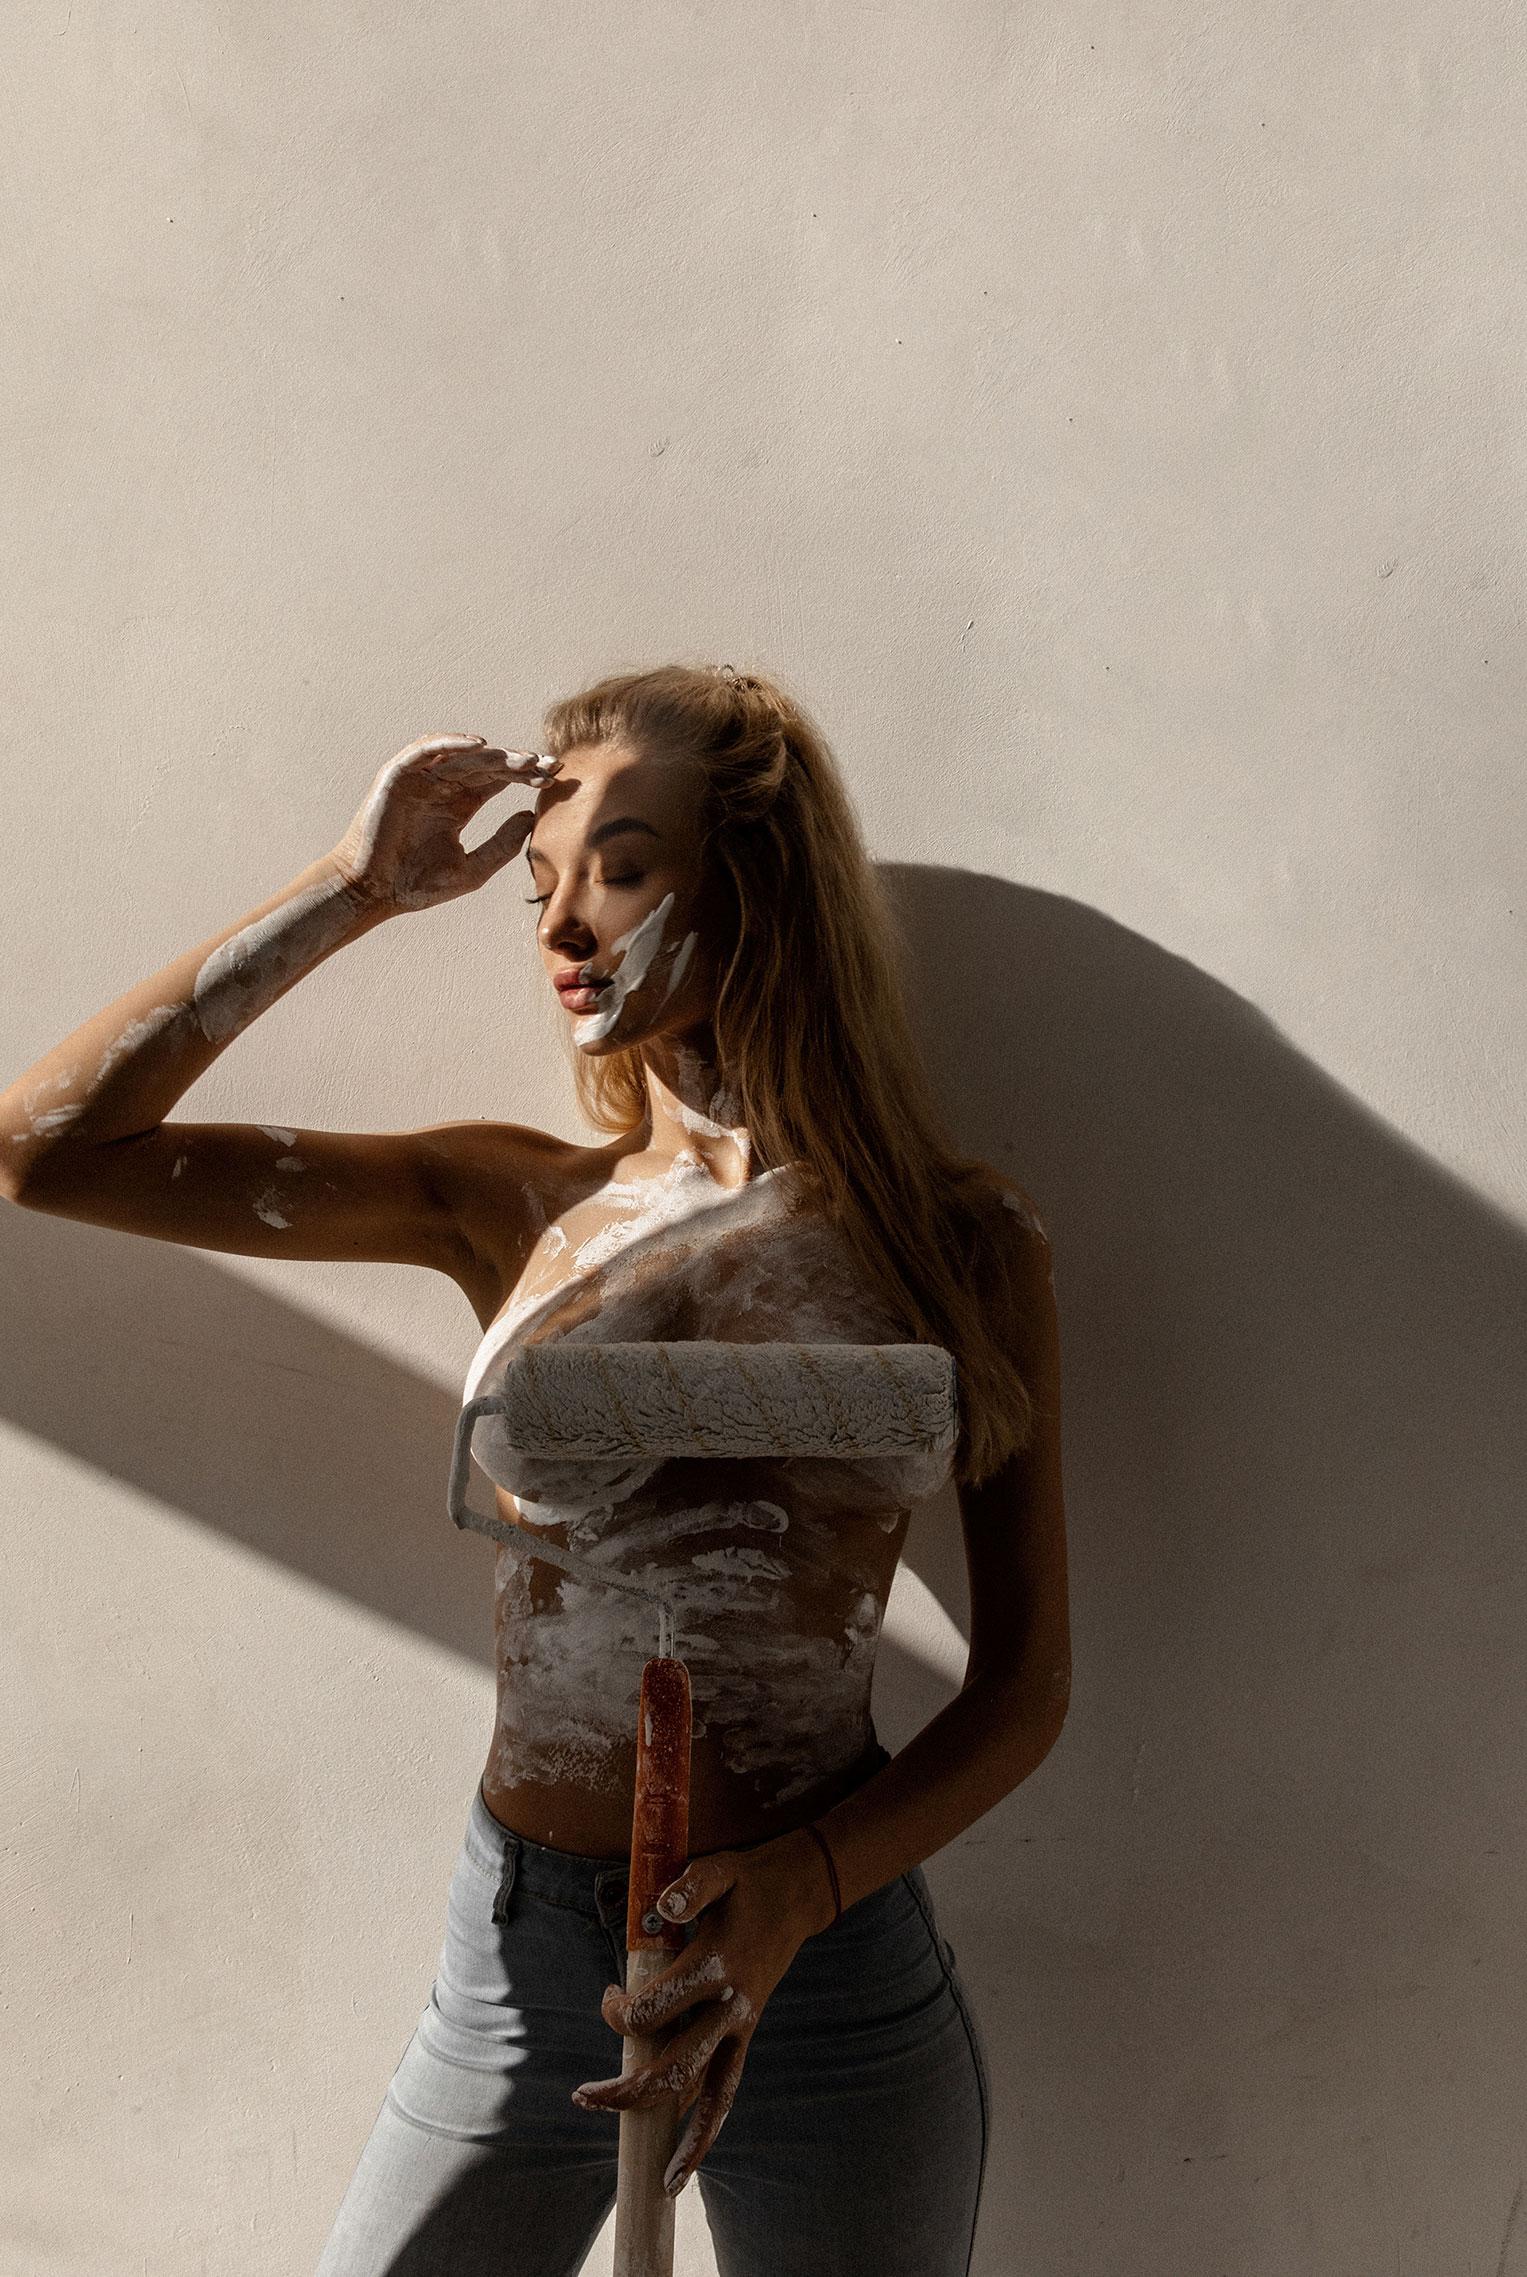 Сексуальная Маша красила стены и заляпалась в краске / фото 05